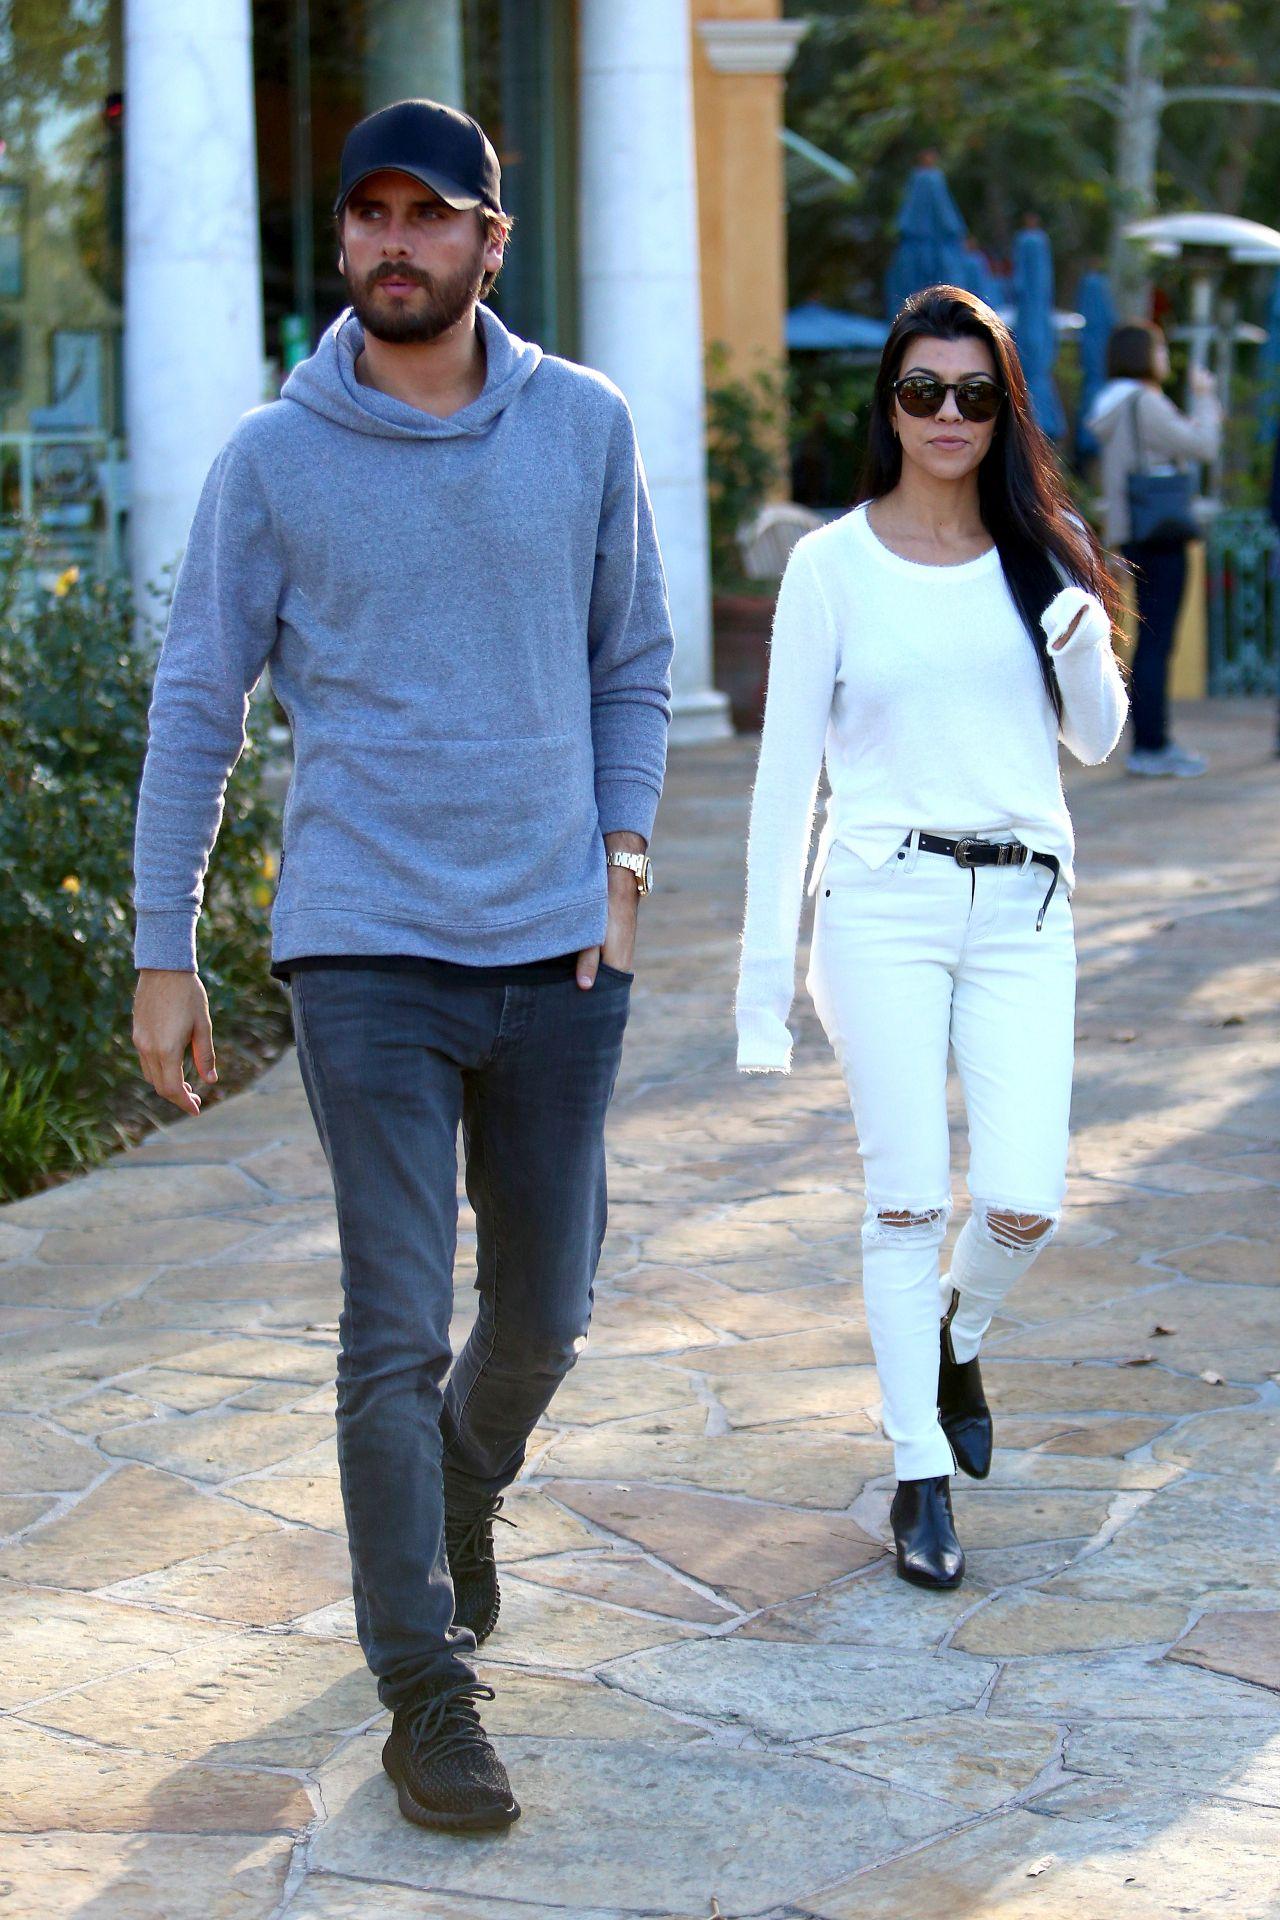 Kourtney Kardashian and Scott Disick- Out in Los Angeles, November 2015